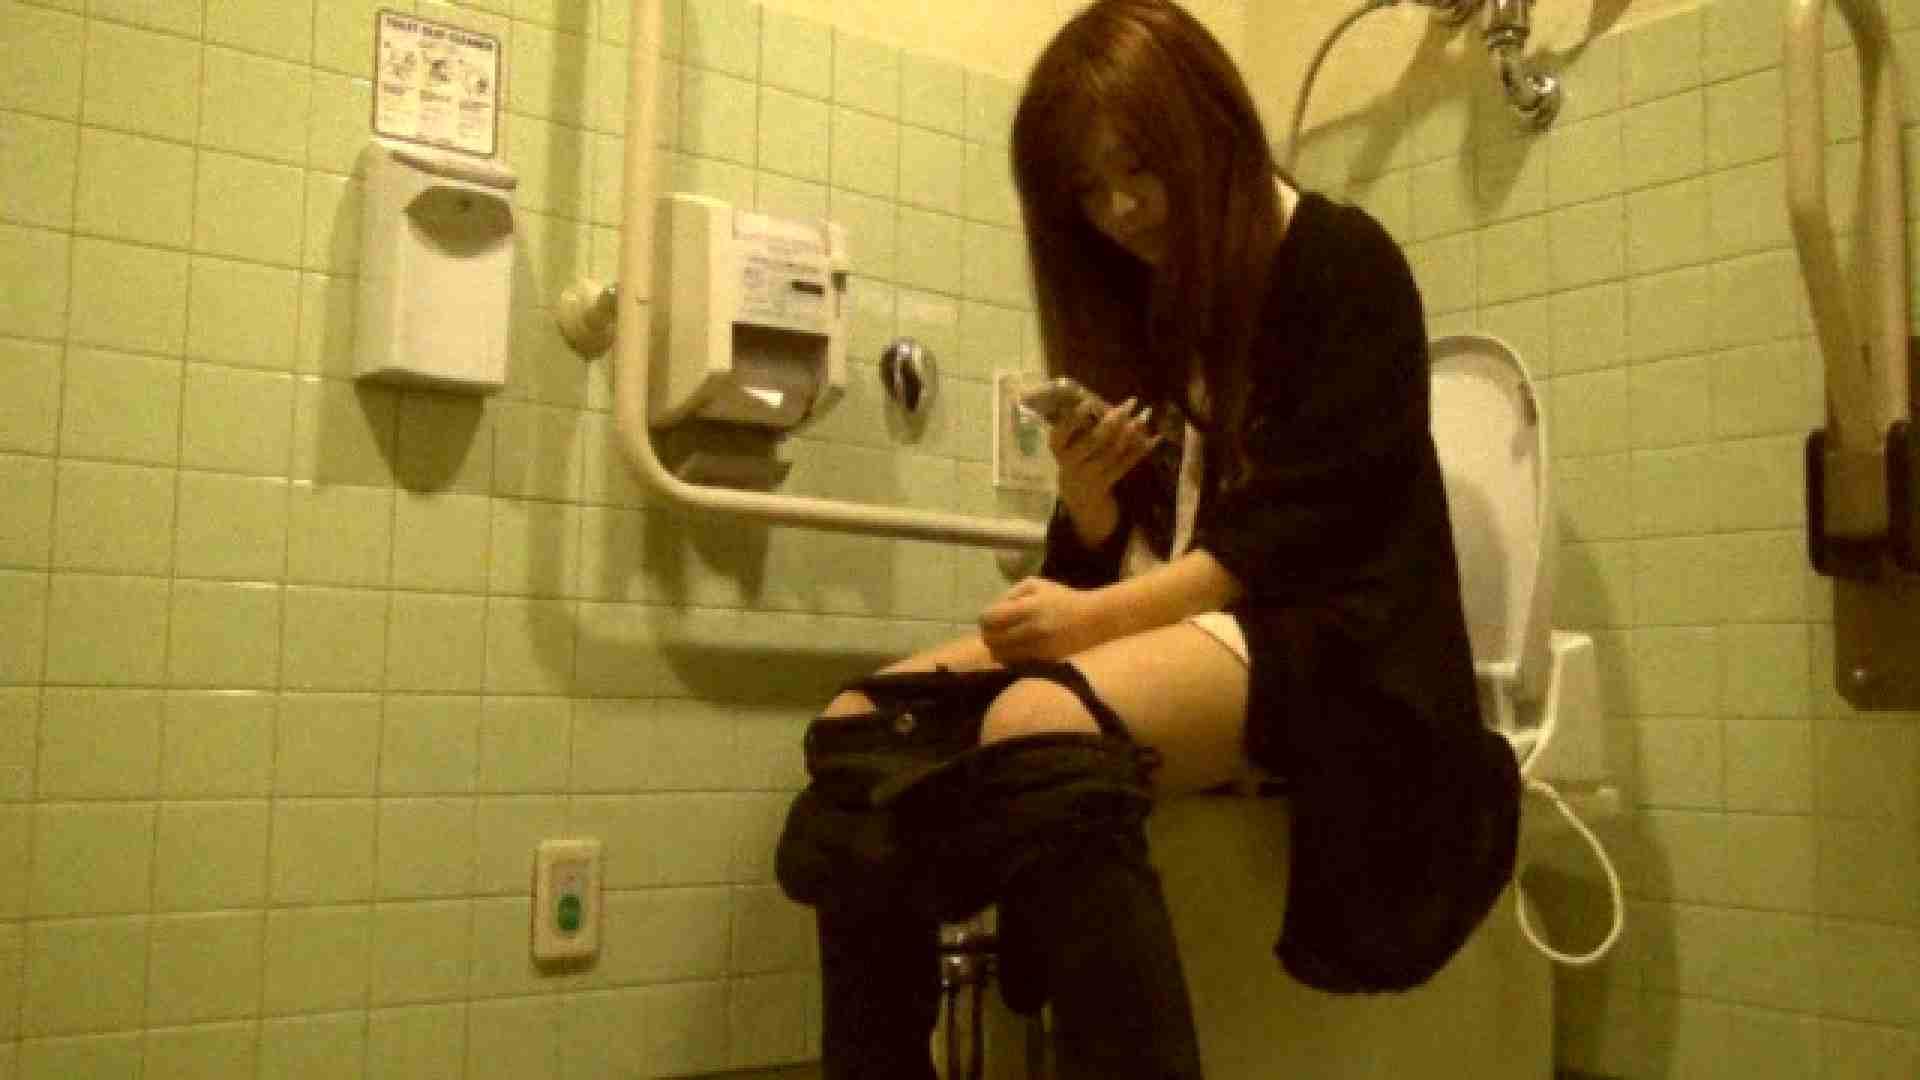 vol.26 【SKちゃん(洗面所)】ガールズバー店員 19歳 キャバ嬢  72PIX 40